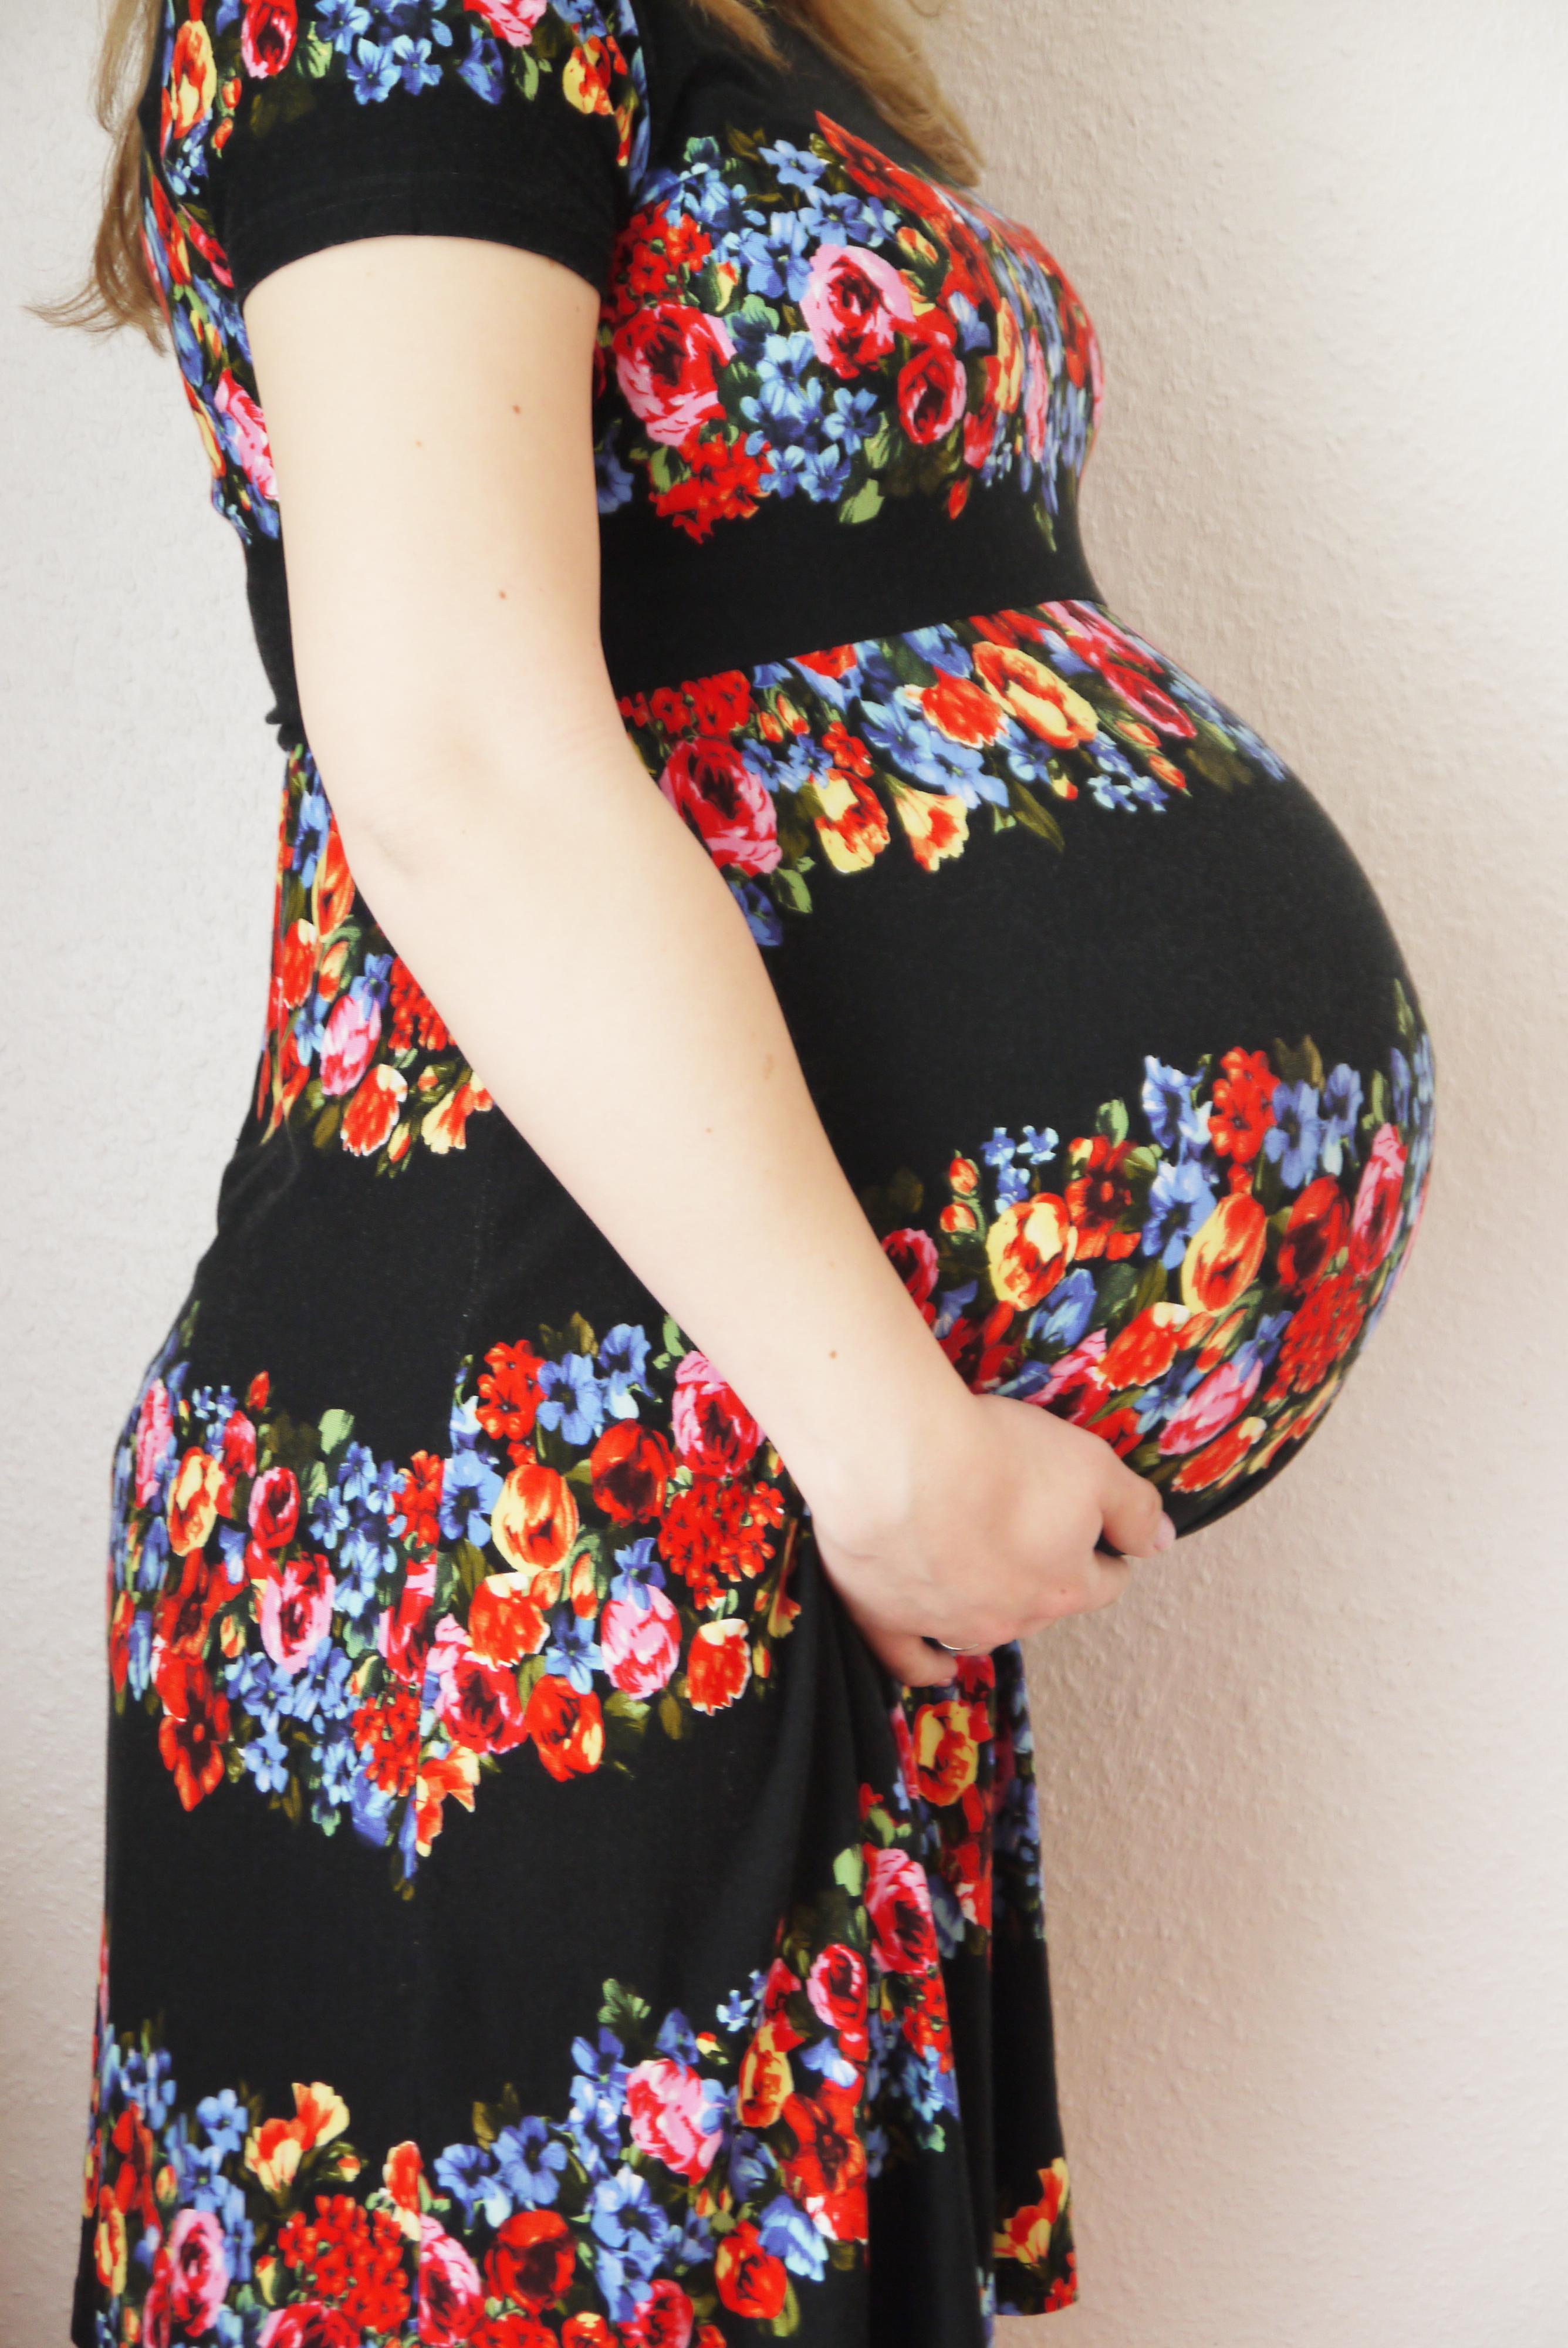 Melanie_38. SSW_Zwilingsschwangerschaft